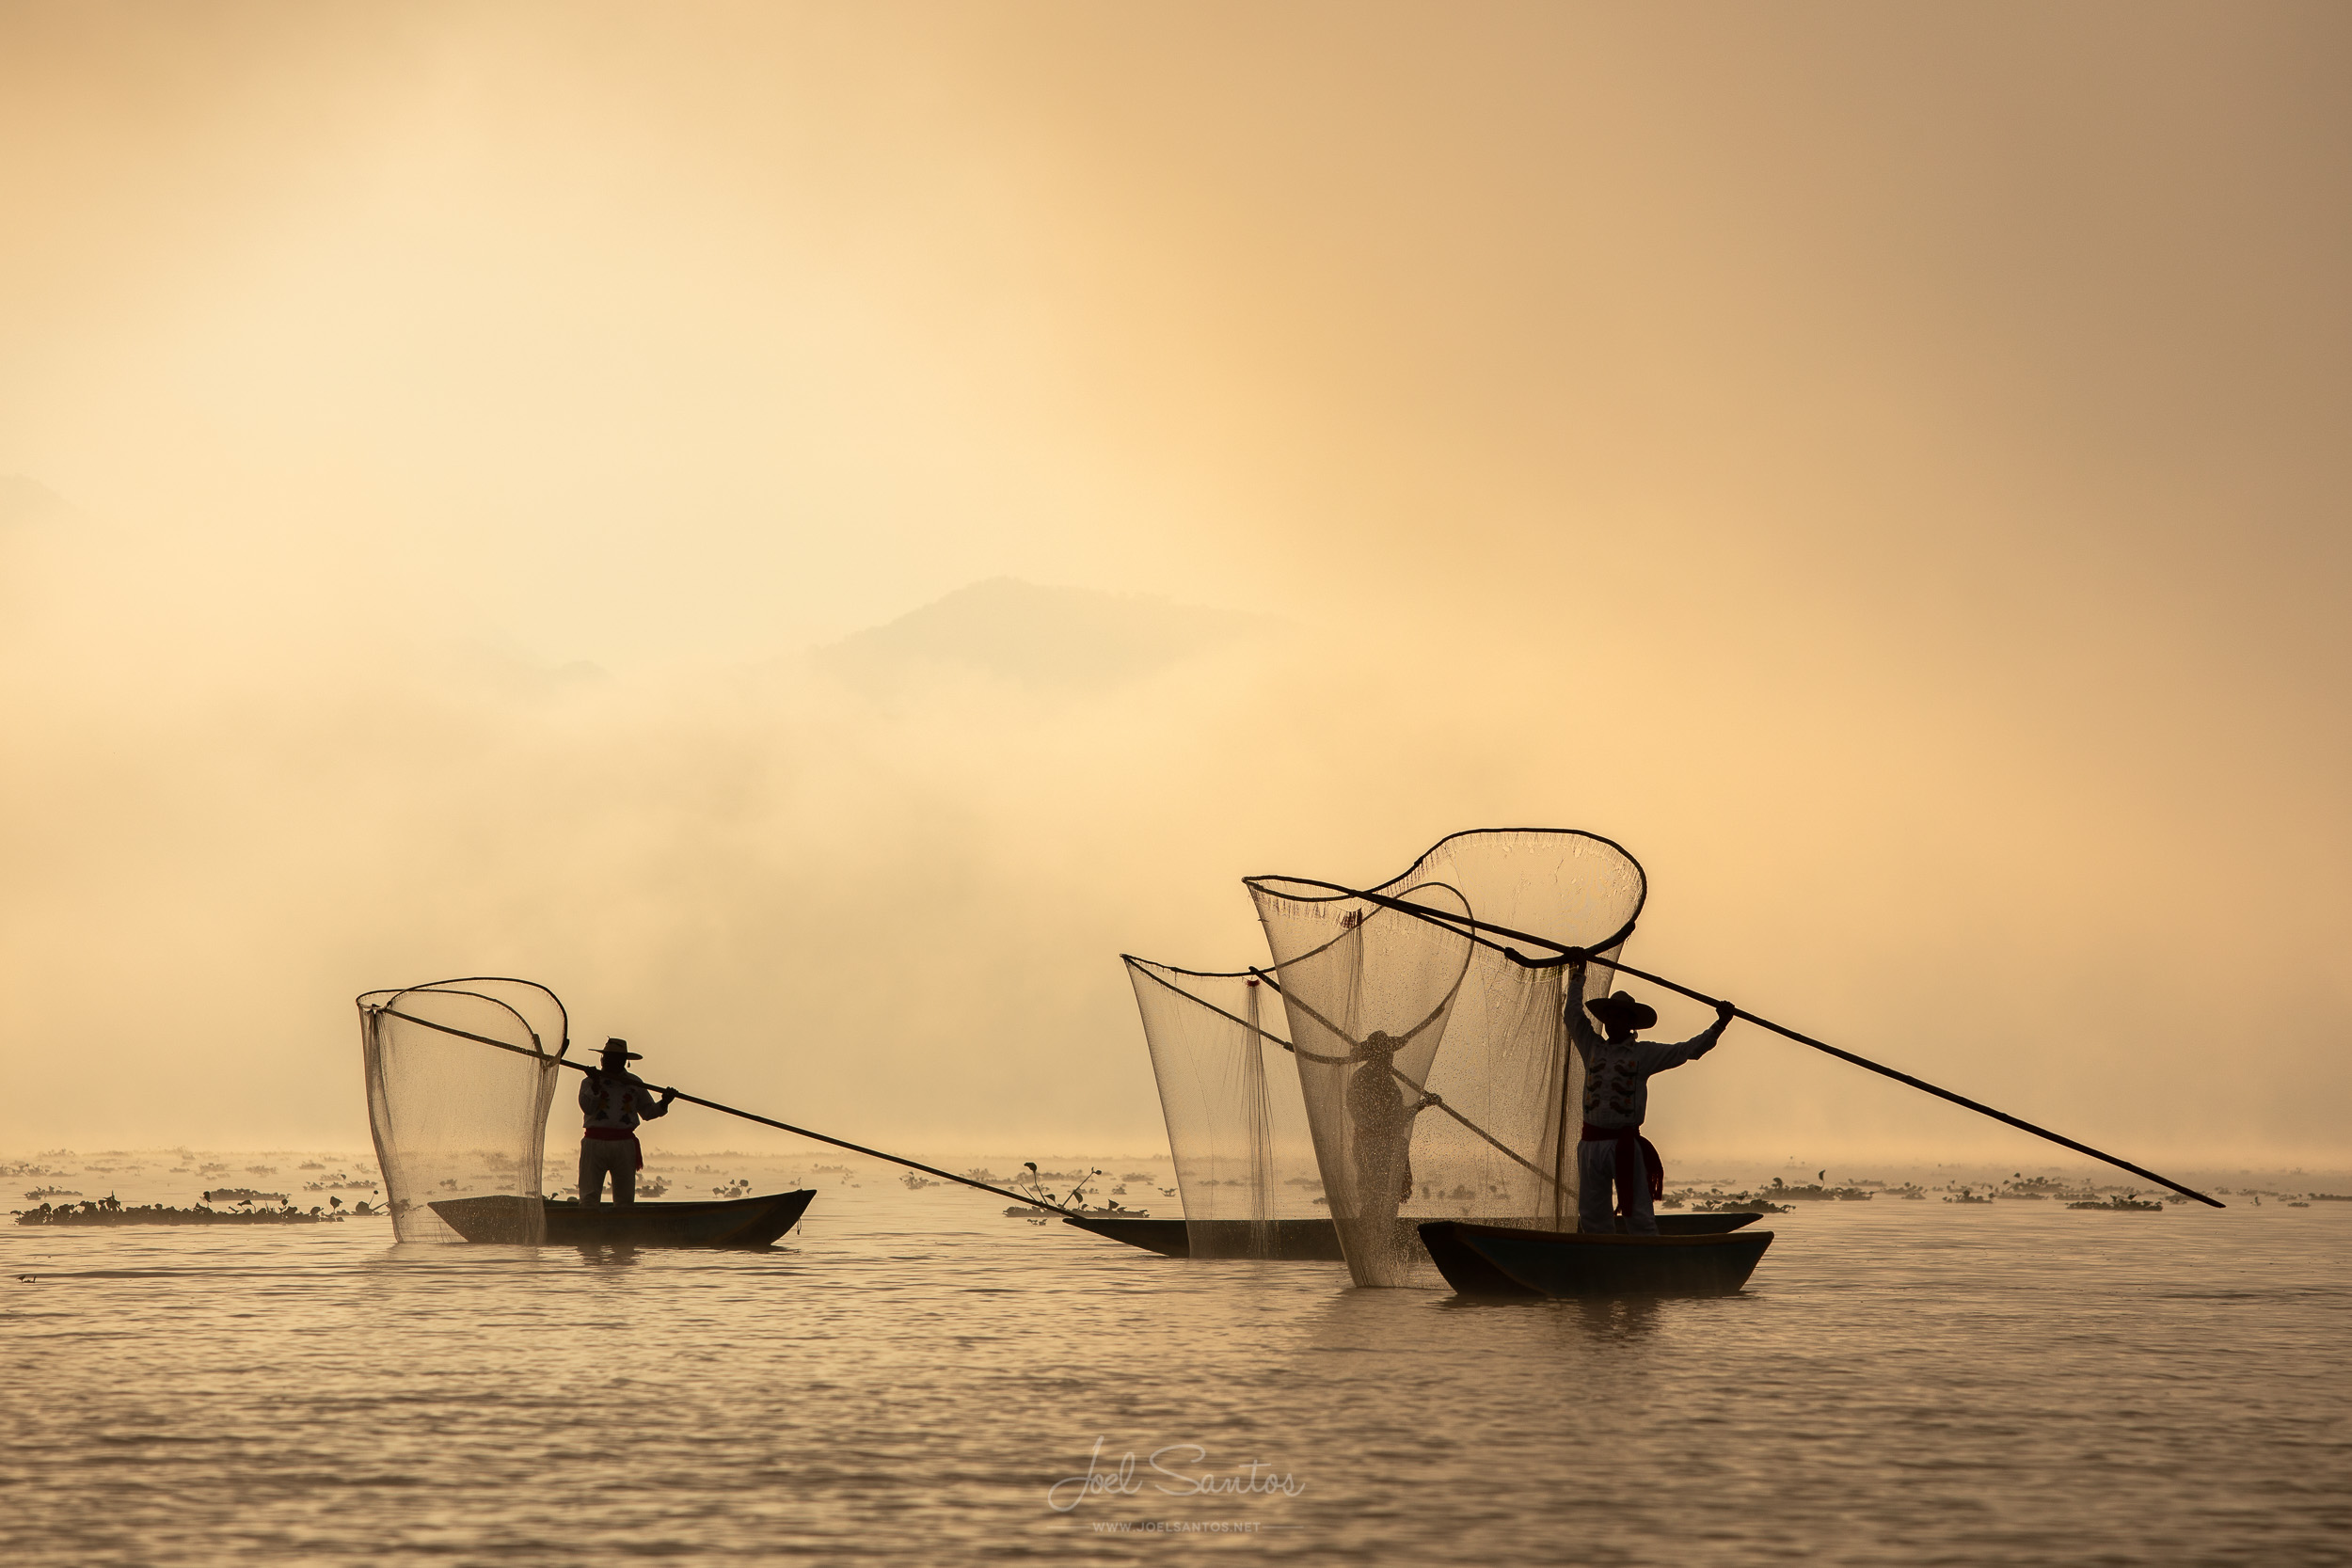 Butterfly net fisherman, Lake Patzcuaro, Michoacan, Mexico